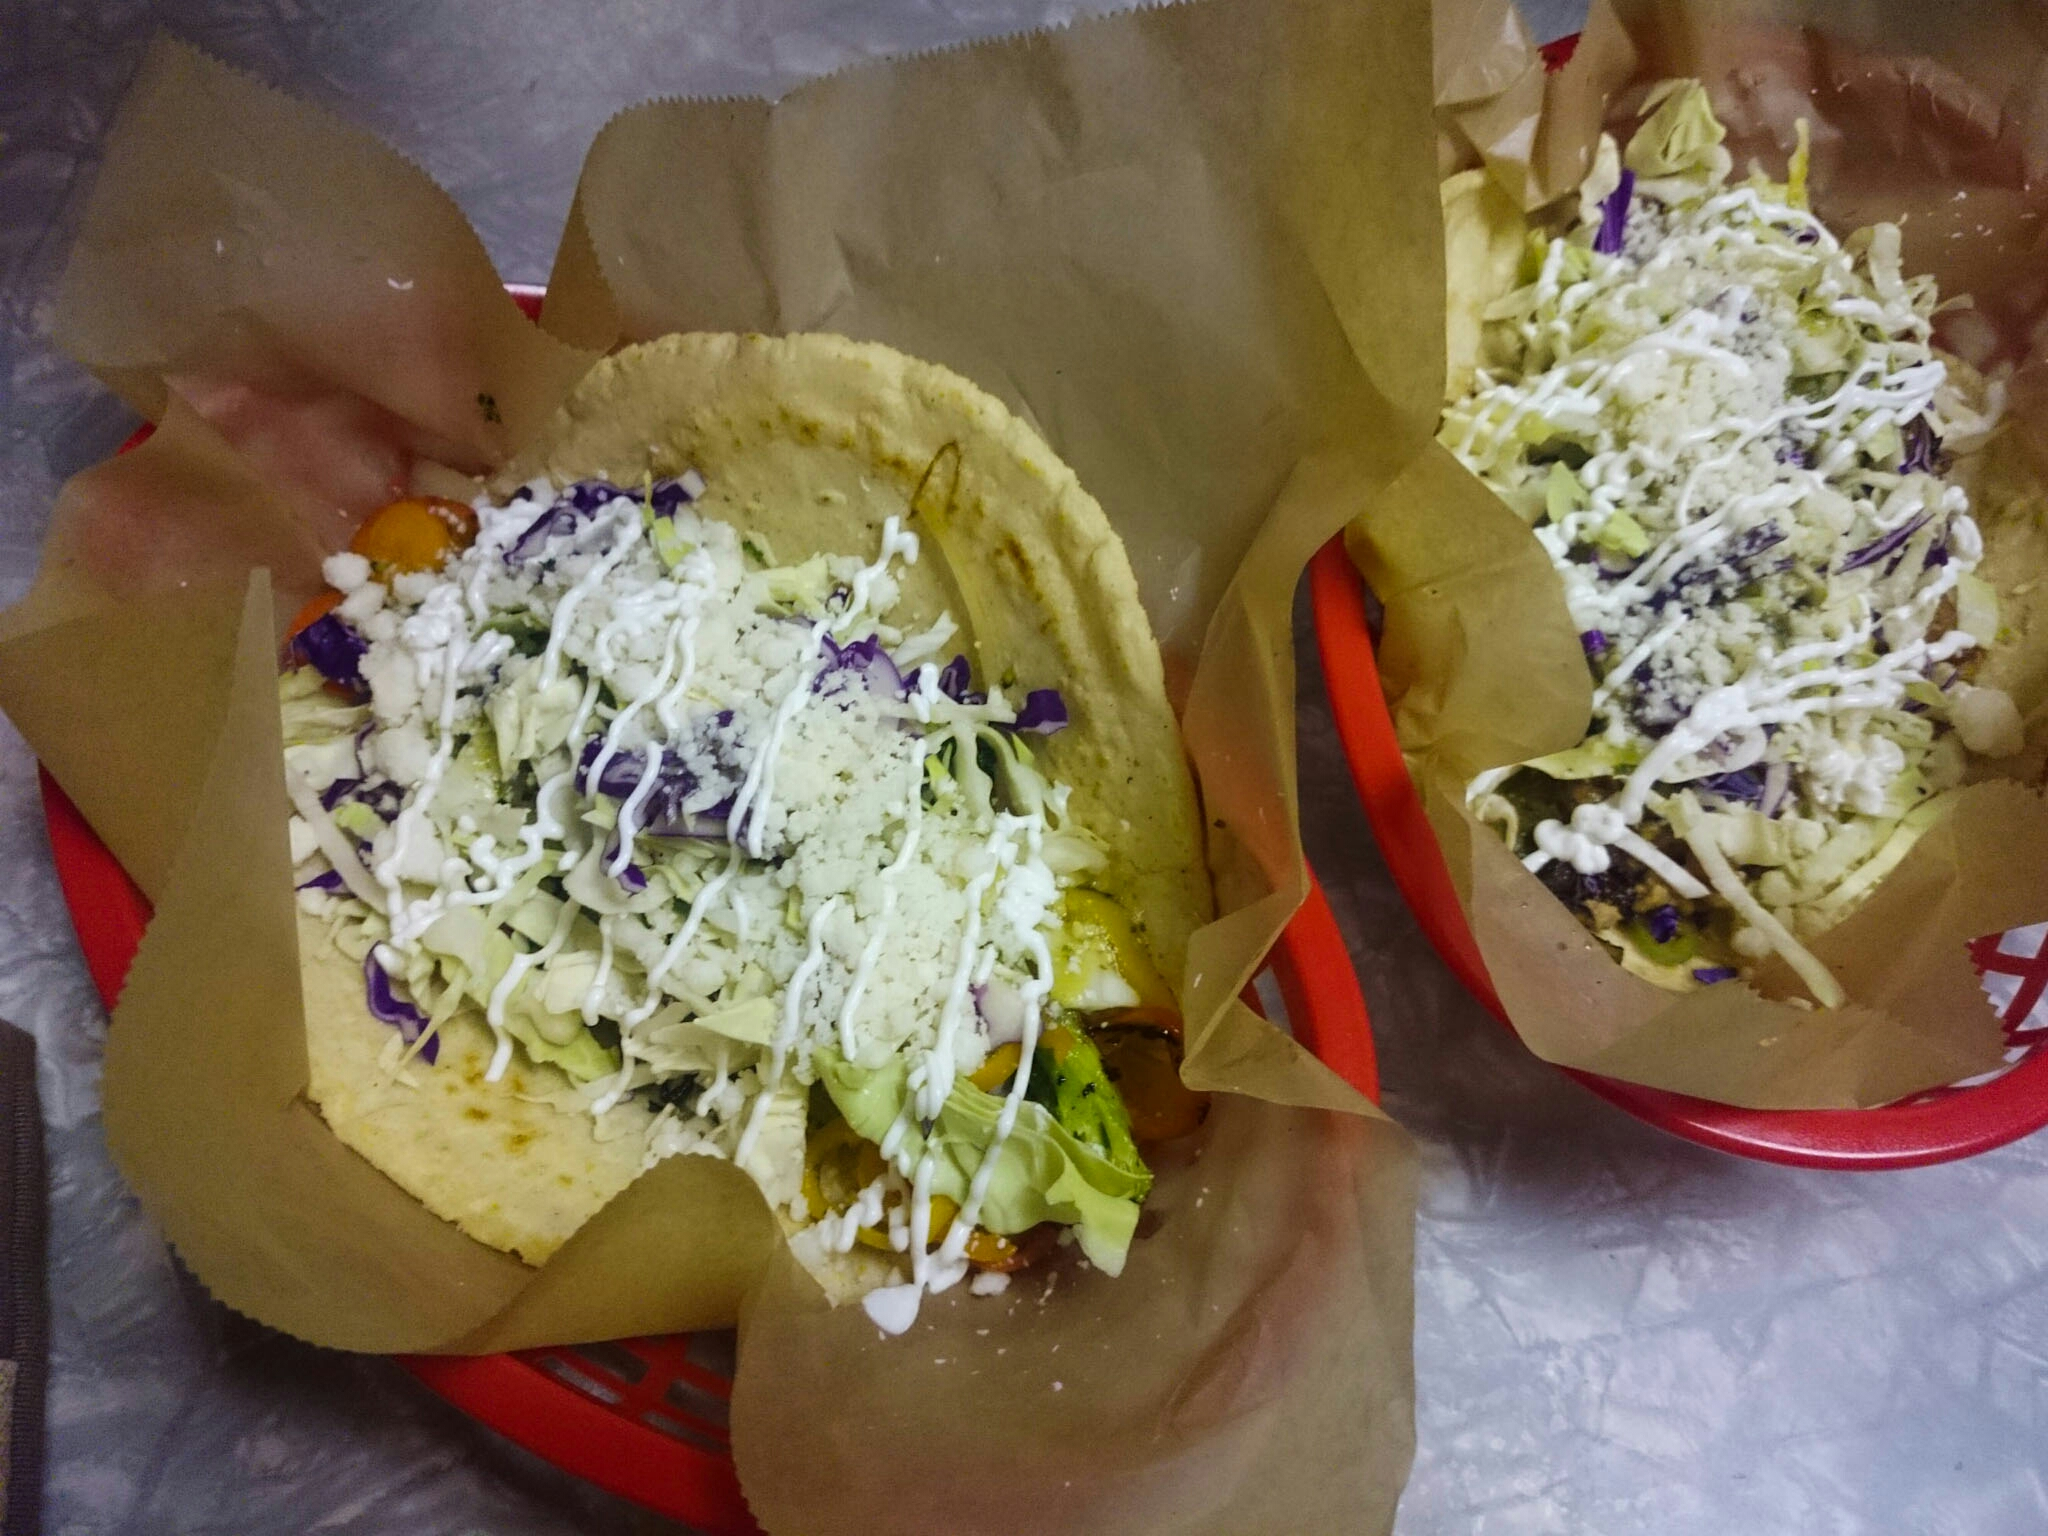 Affordable and really tasty tacos at Tiki Tacos - Kapaa, Kauai